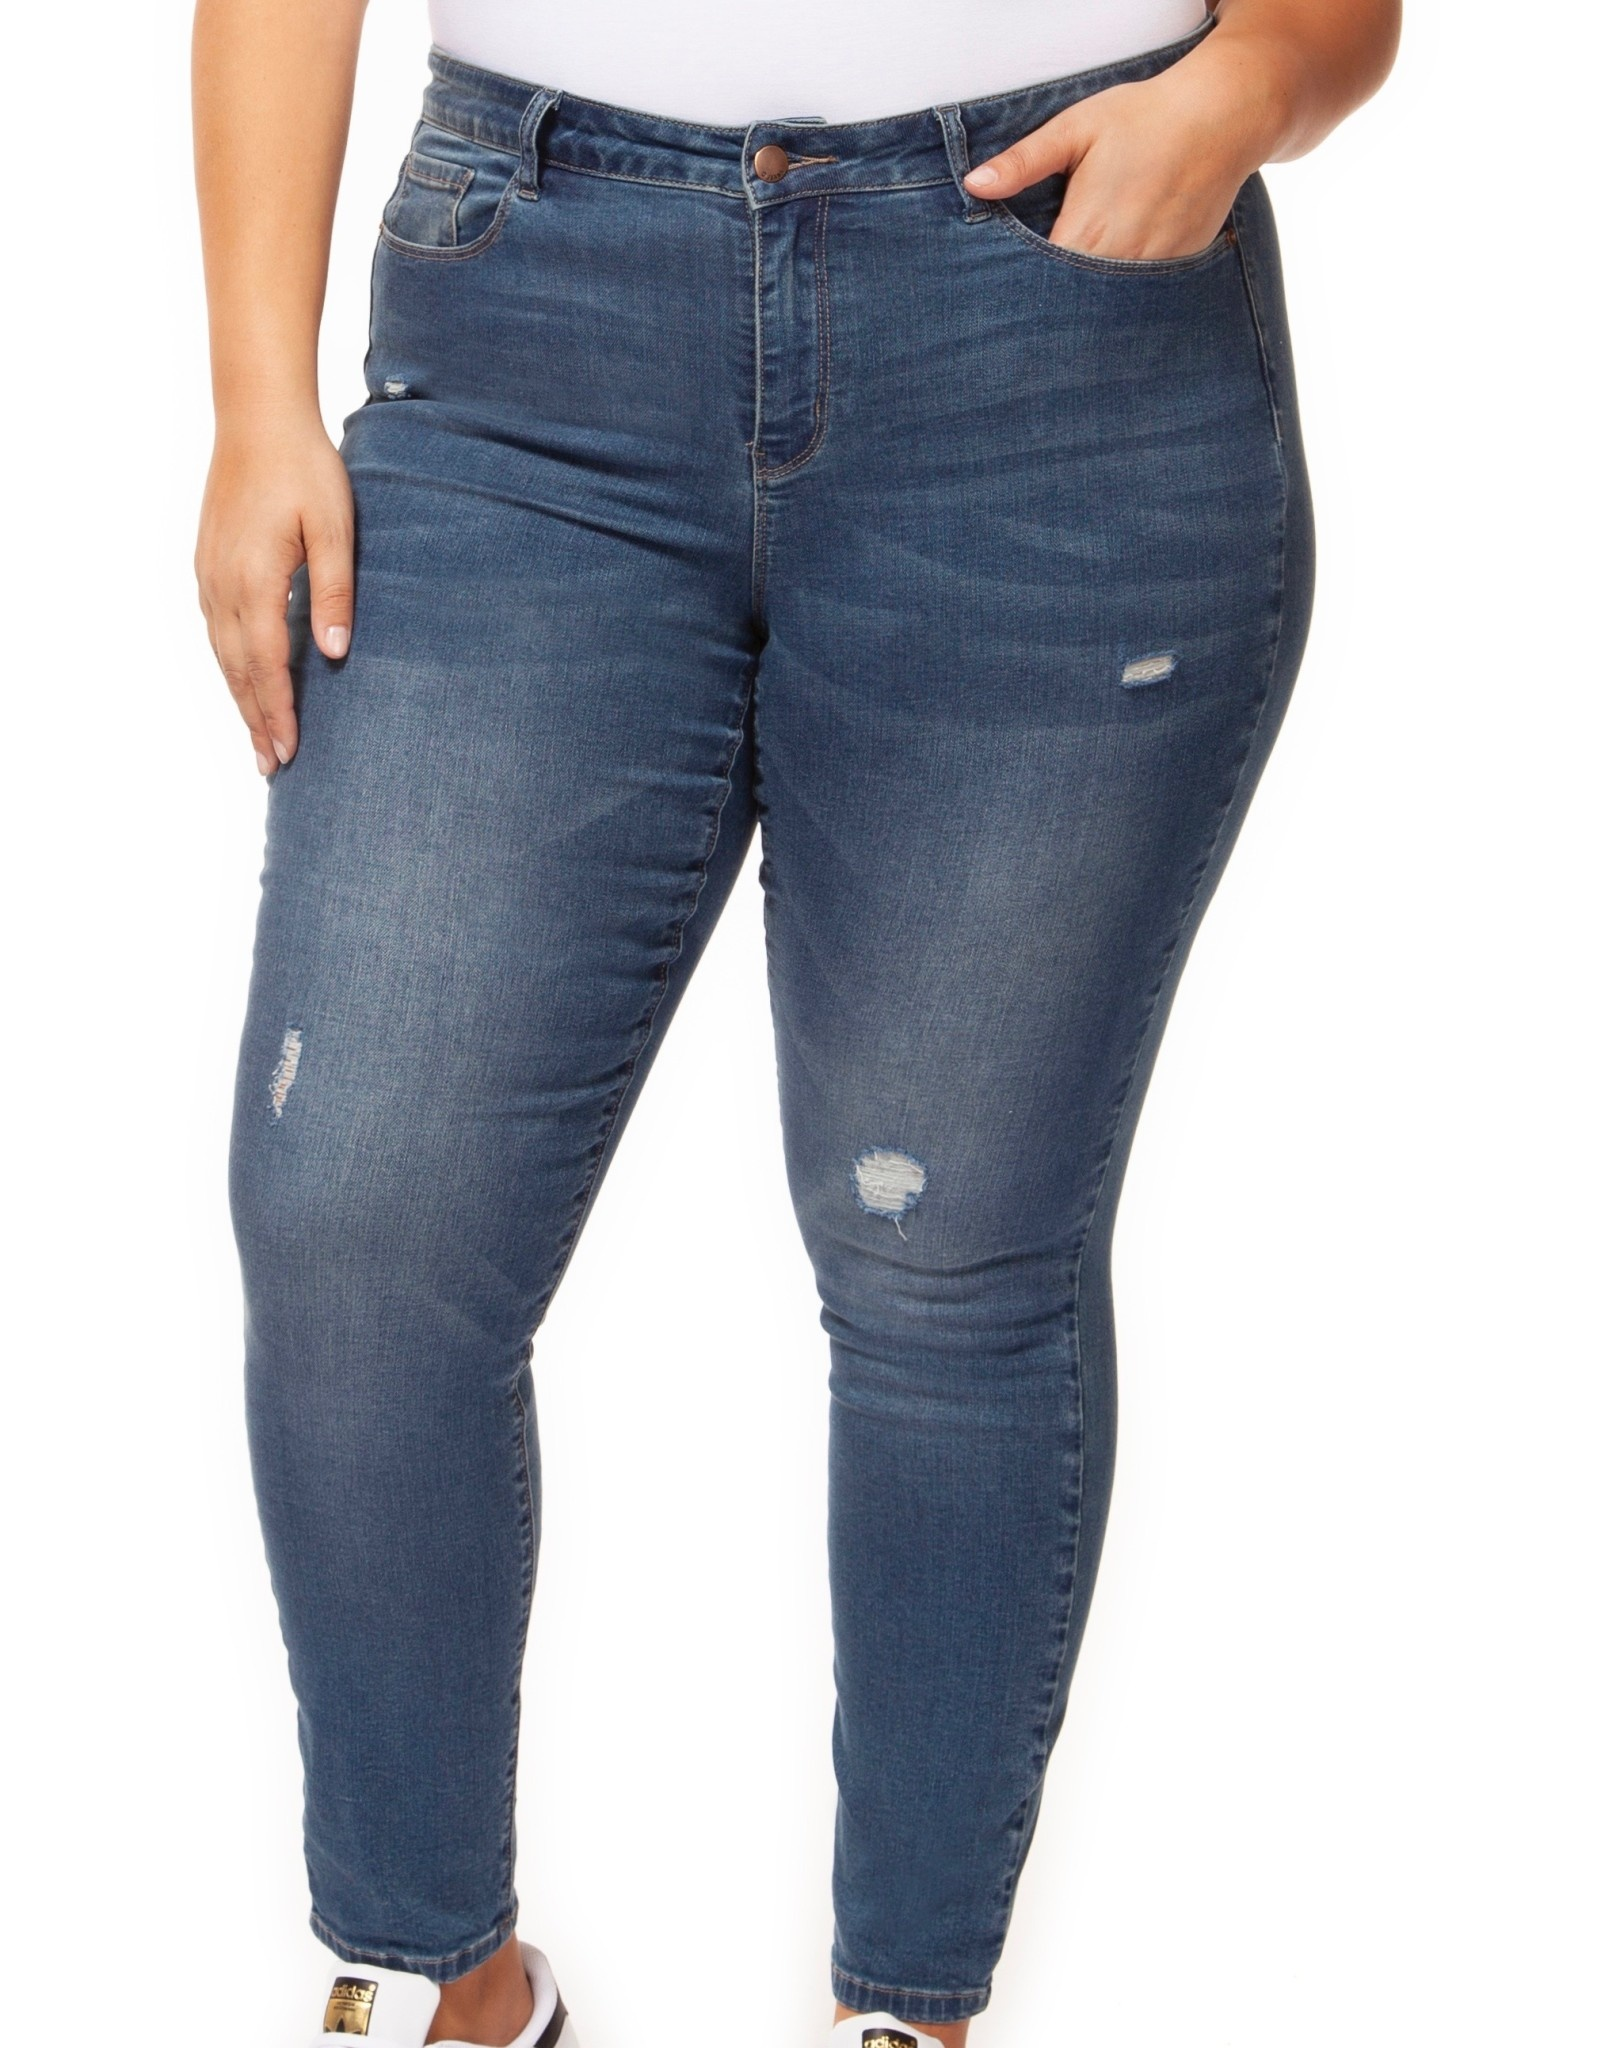 Dex Vintage Wash Jeans